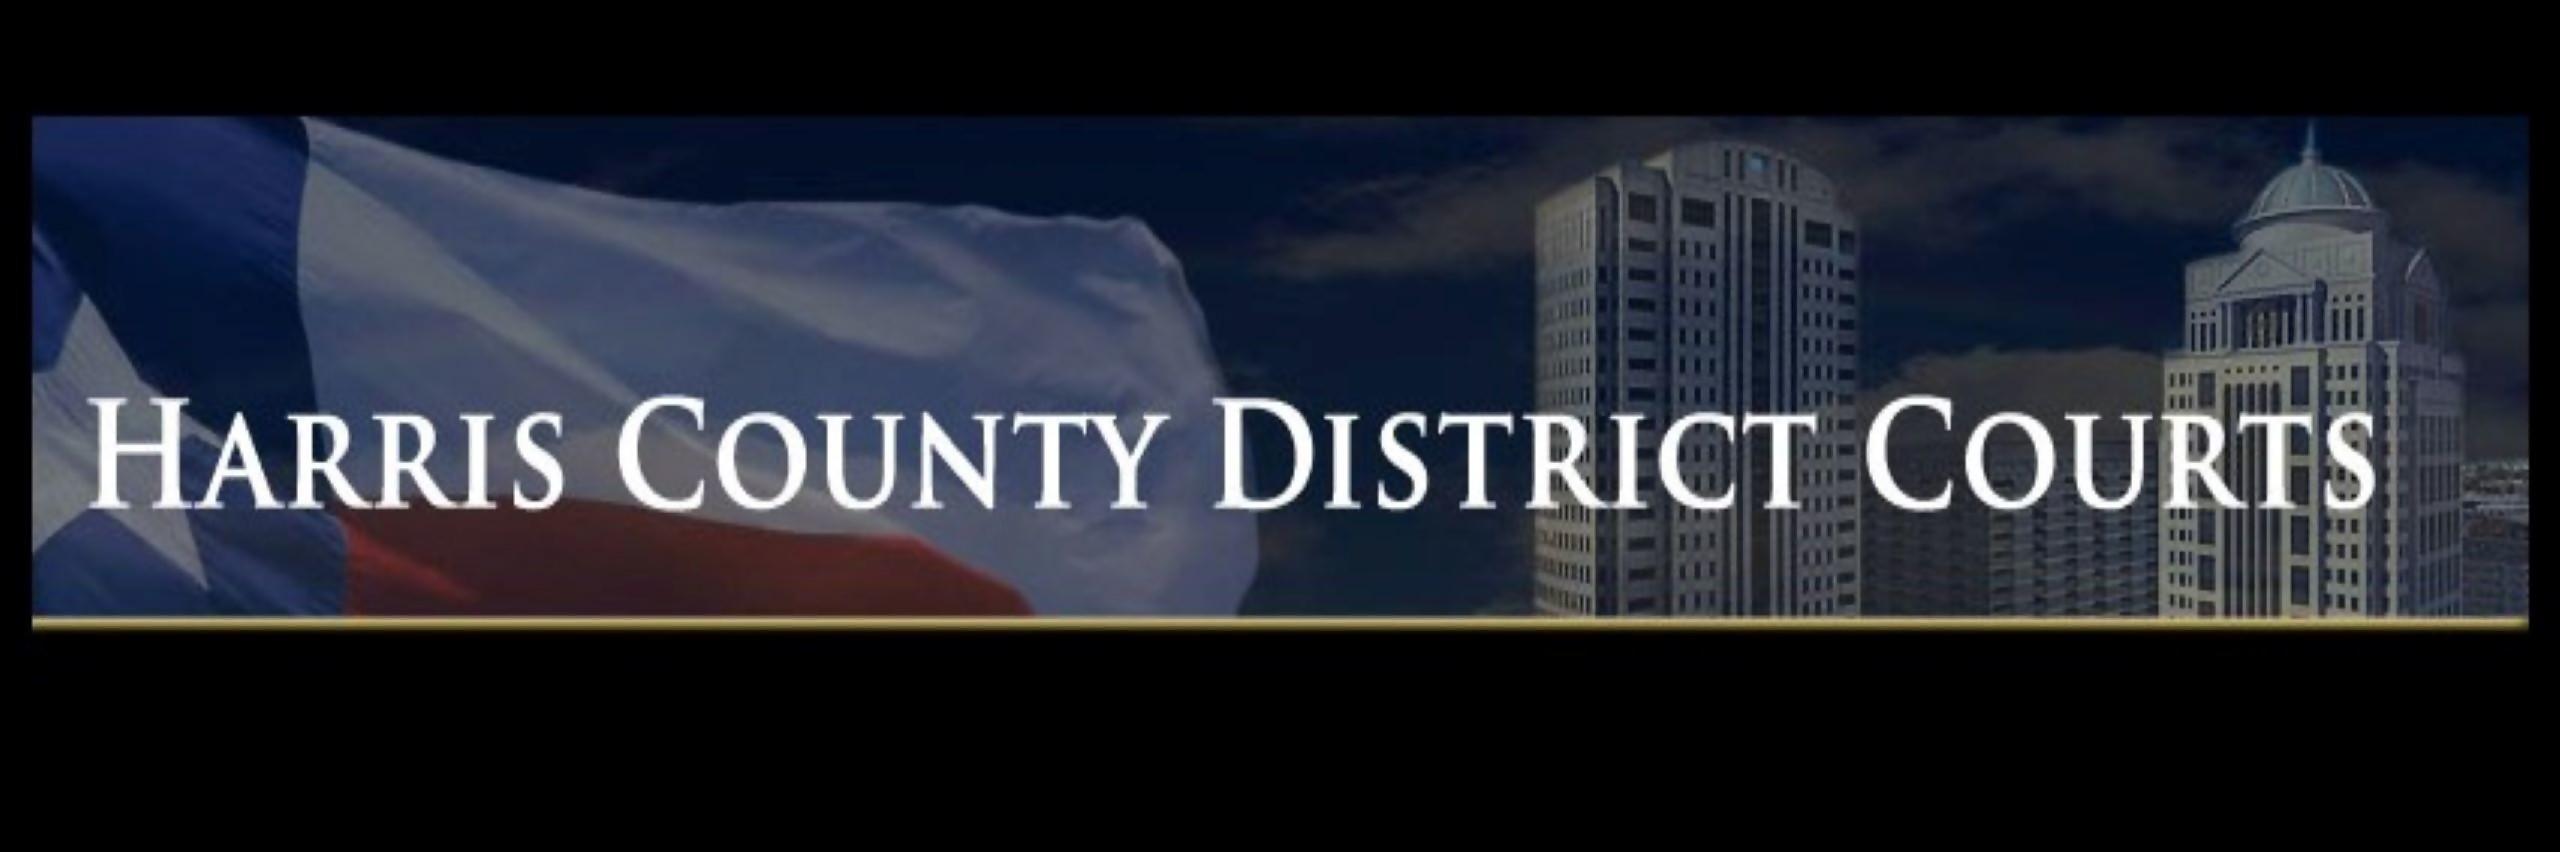 209th District Court - Live Stream